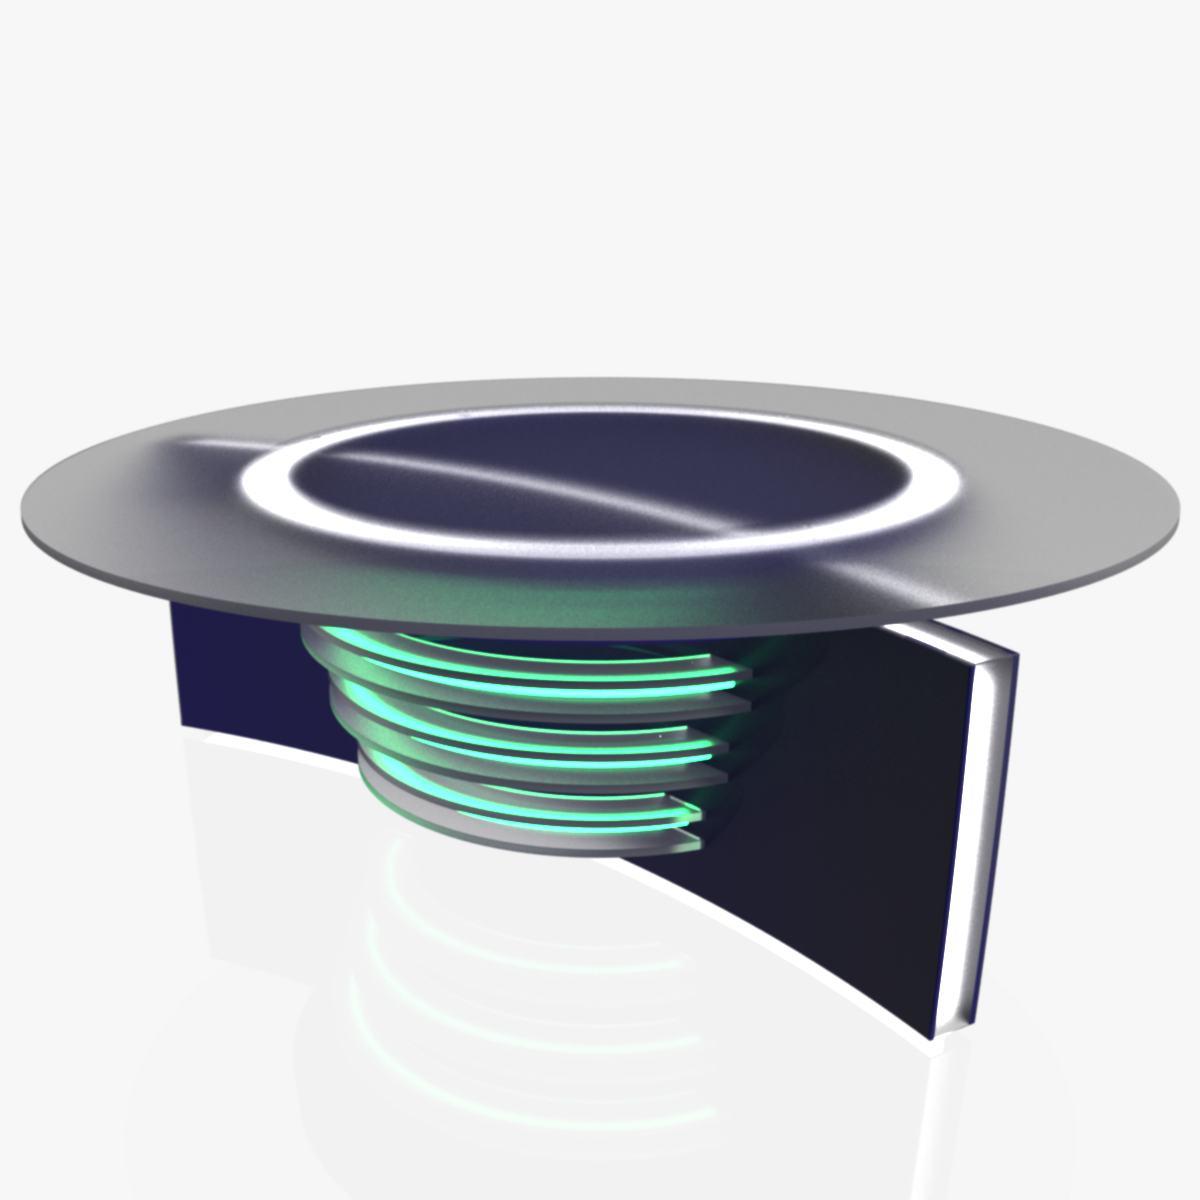 Virtual Tv Studio News Desk 6 3d Model Chair Tv 3ds Max Dxf Fbx  # Meuble Tv Nesx